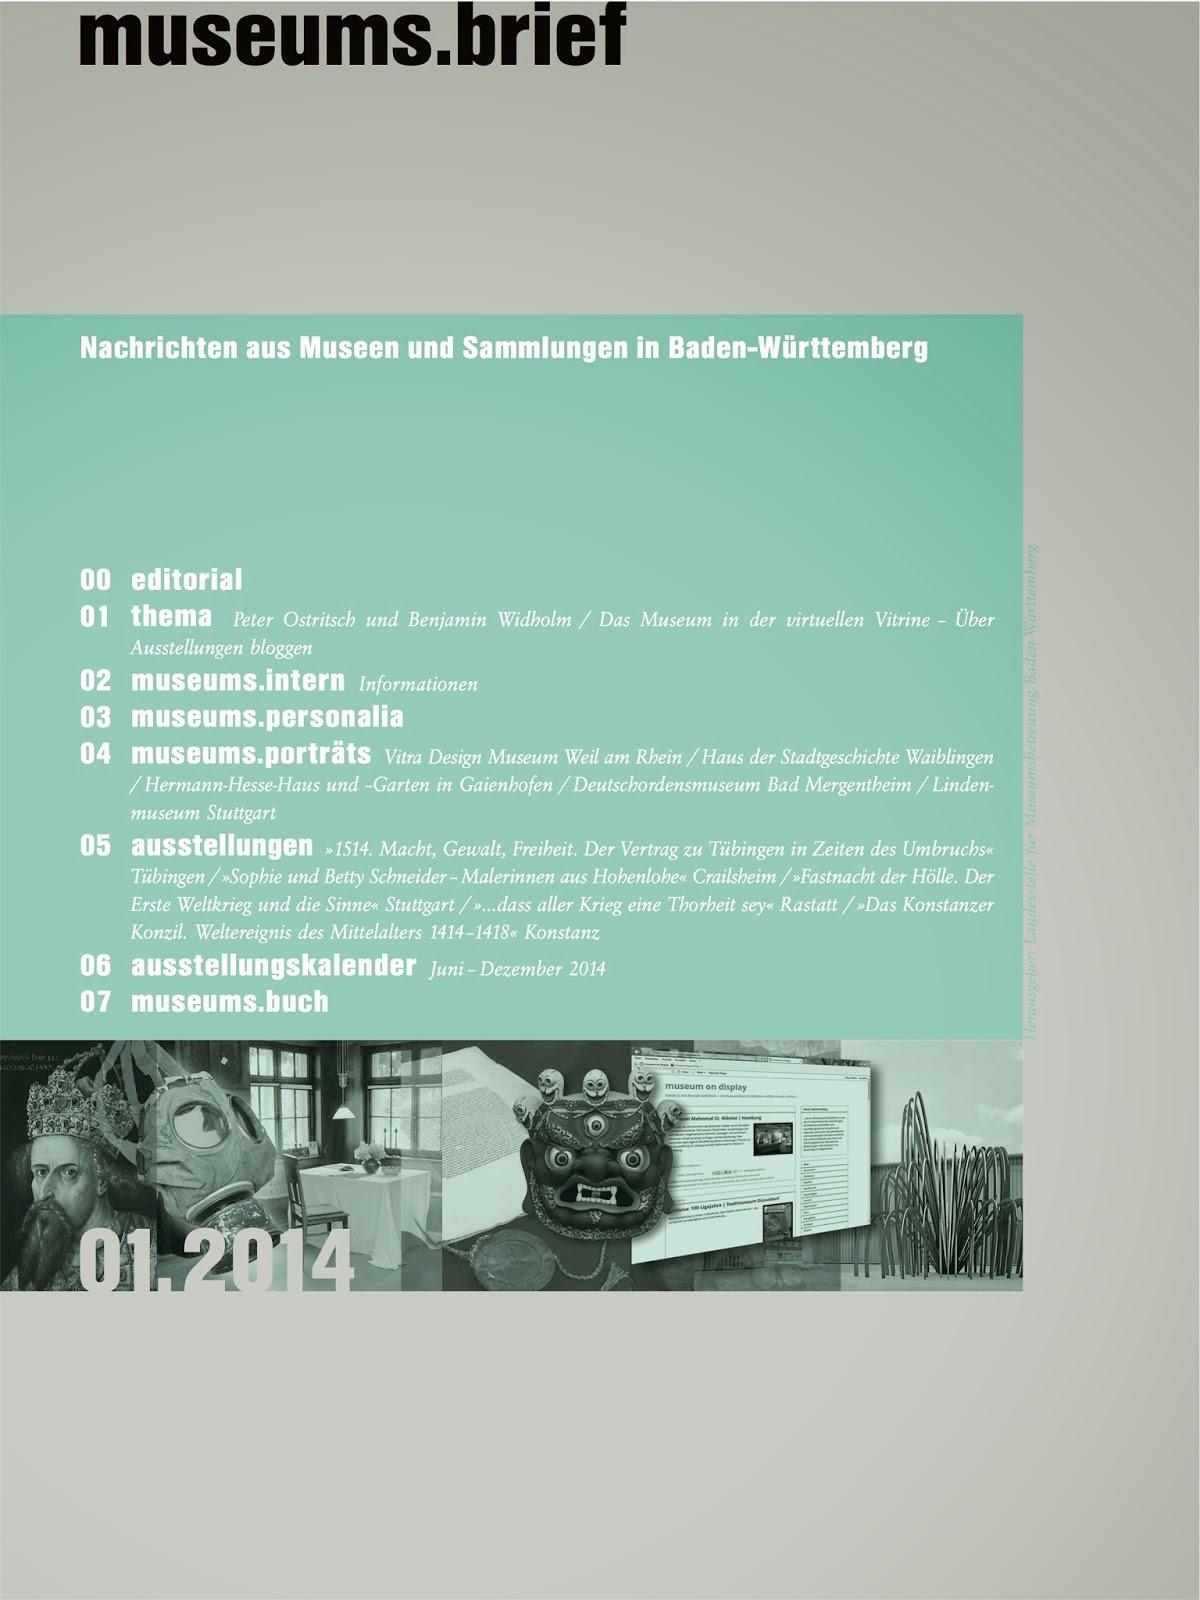 museums.brief, Zeitschrift, Artikel, bloggen, Museumsblog, Benjamin Widholm, Peter Ostritsch